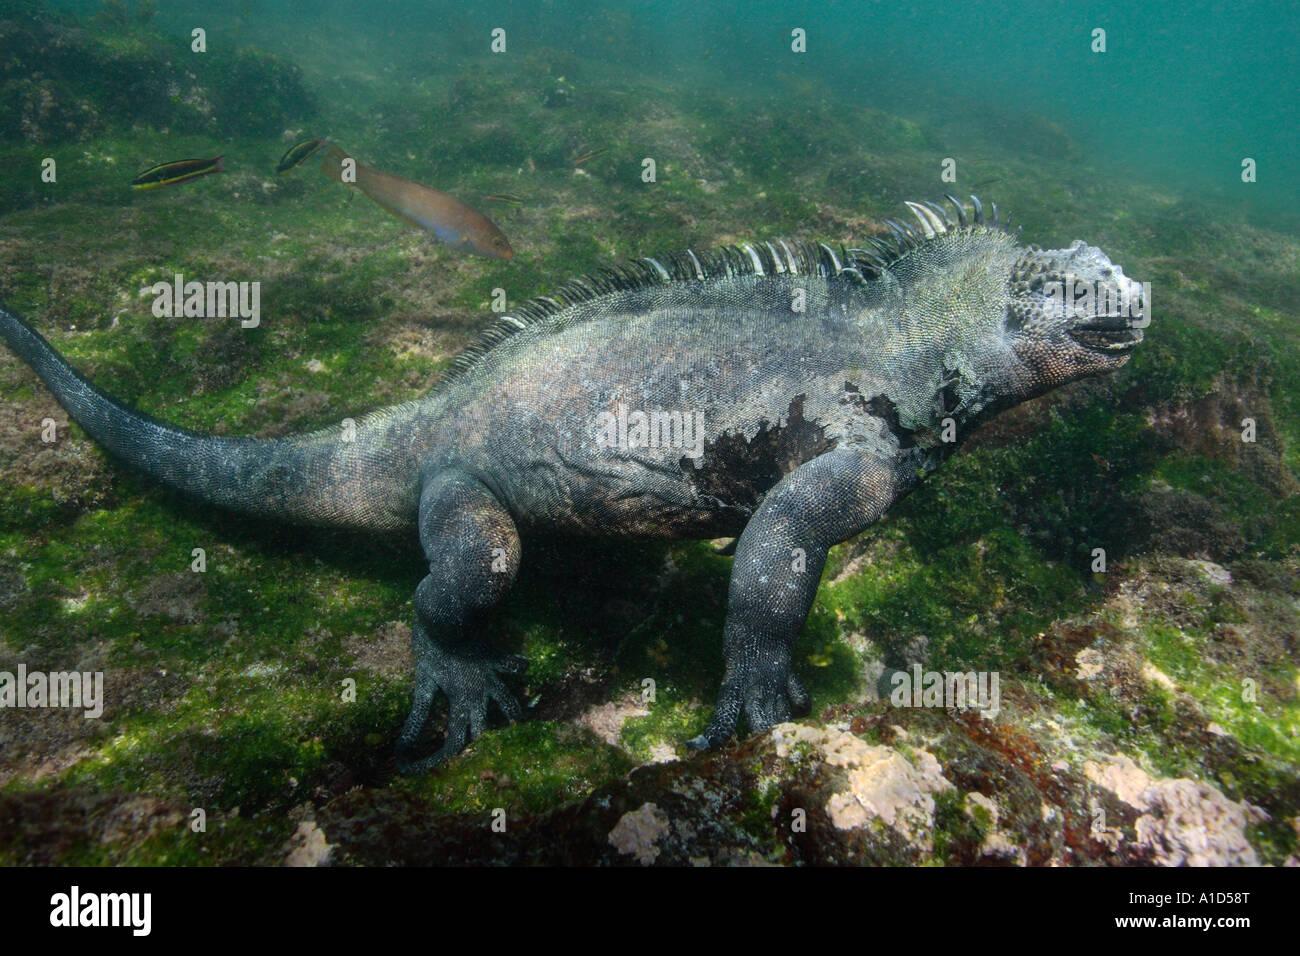 Nu2381. Iguana marina, Amblyrhynchus cristatus, alimentándose de algas submarinas. Galápagos. Foto Copyright Imagen De Stock